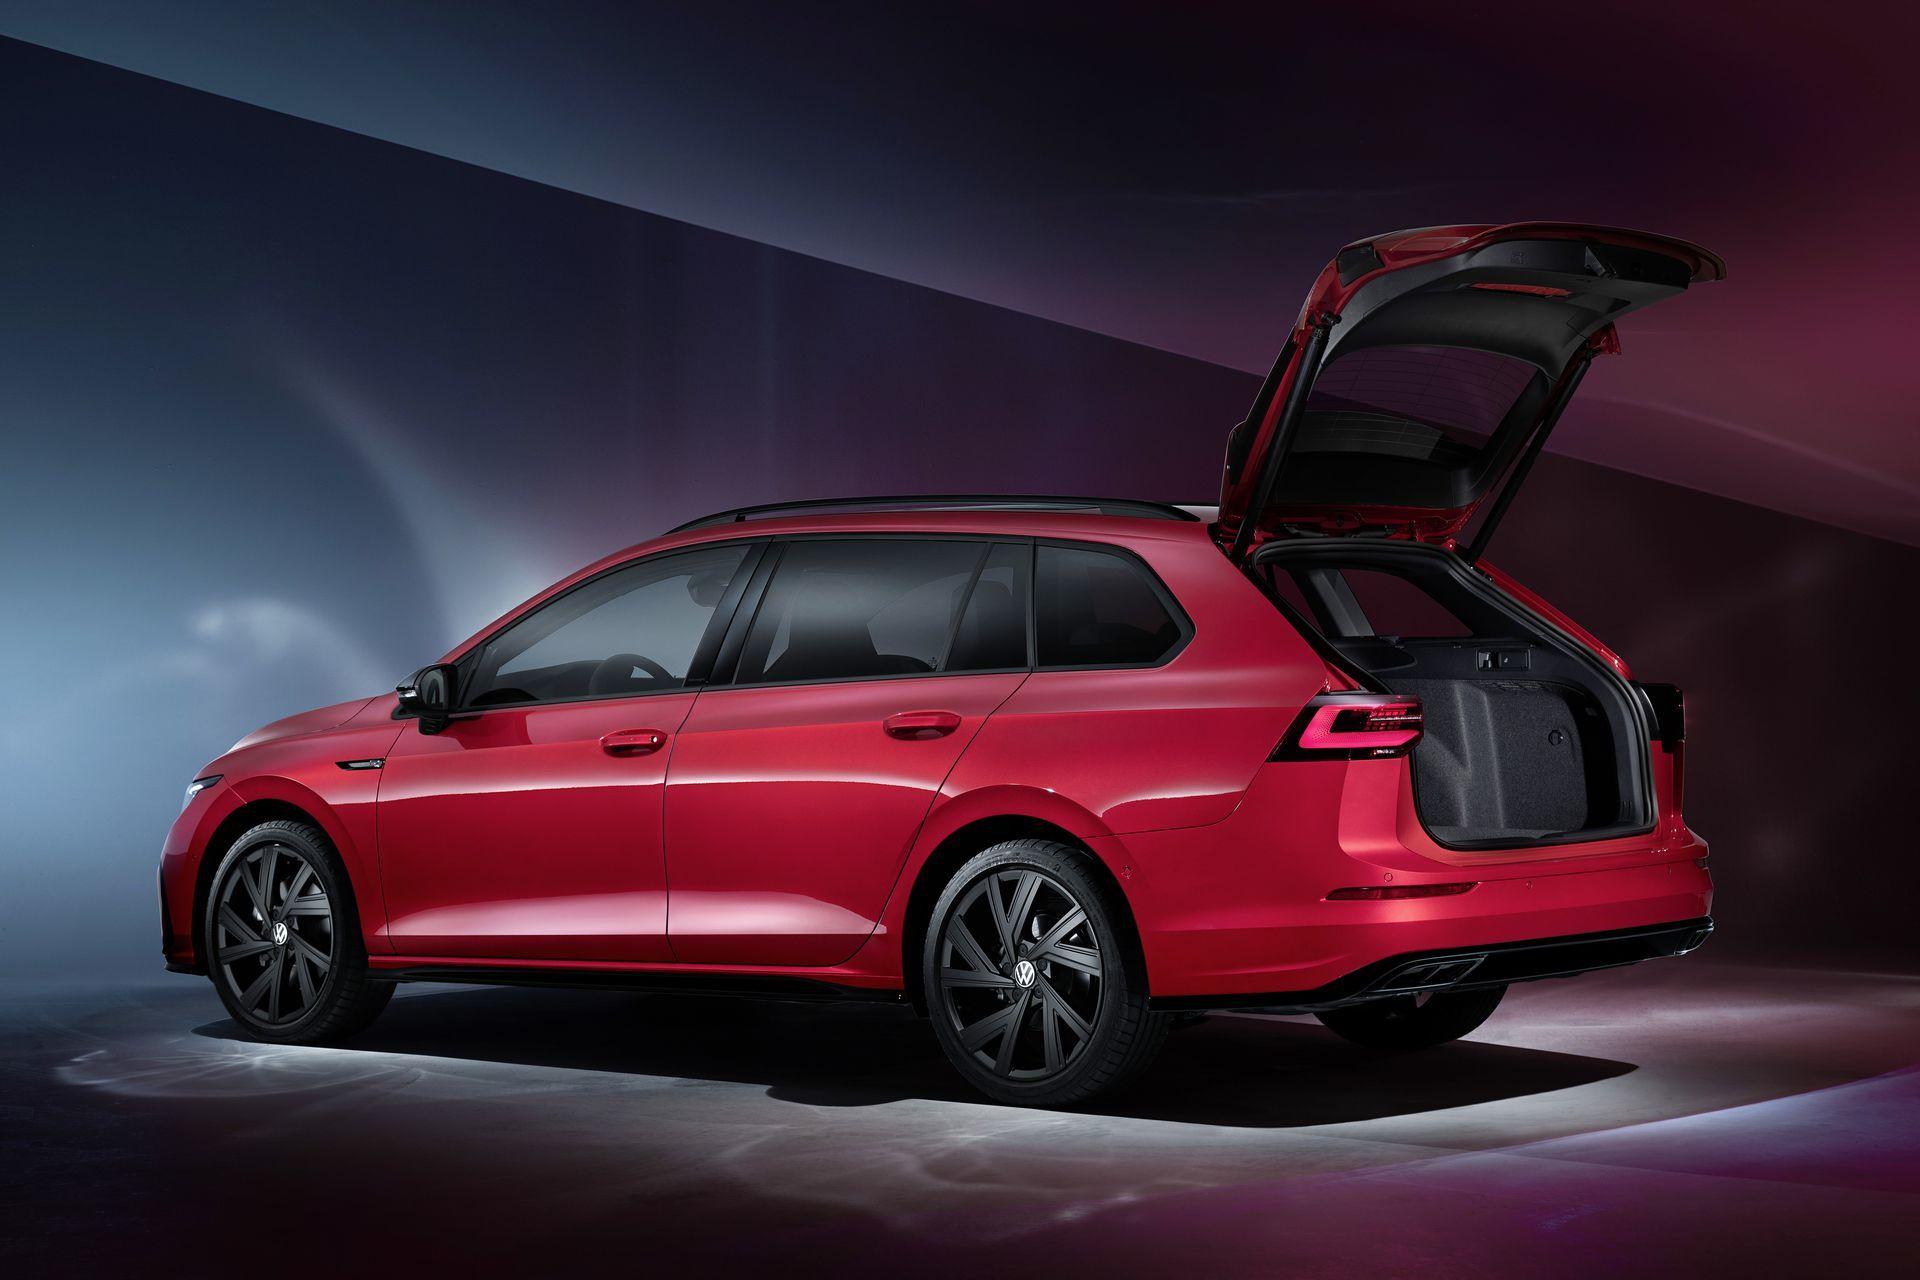 The New Volkswagen Golf Variant R Line